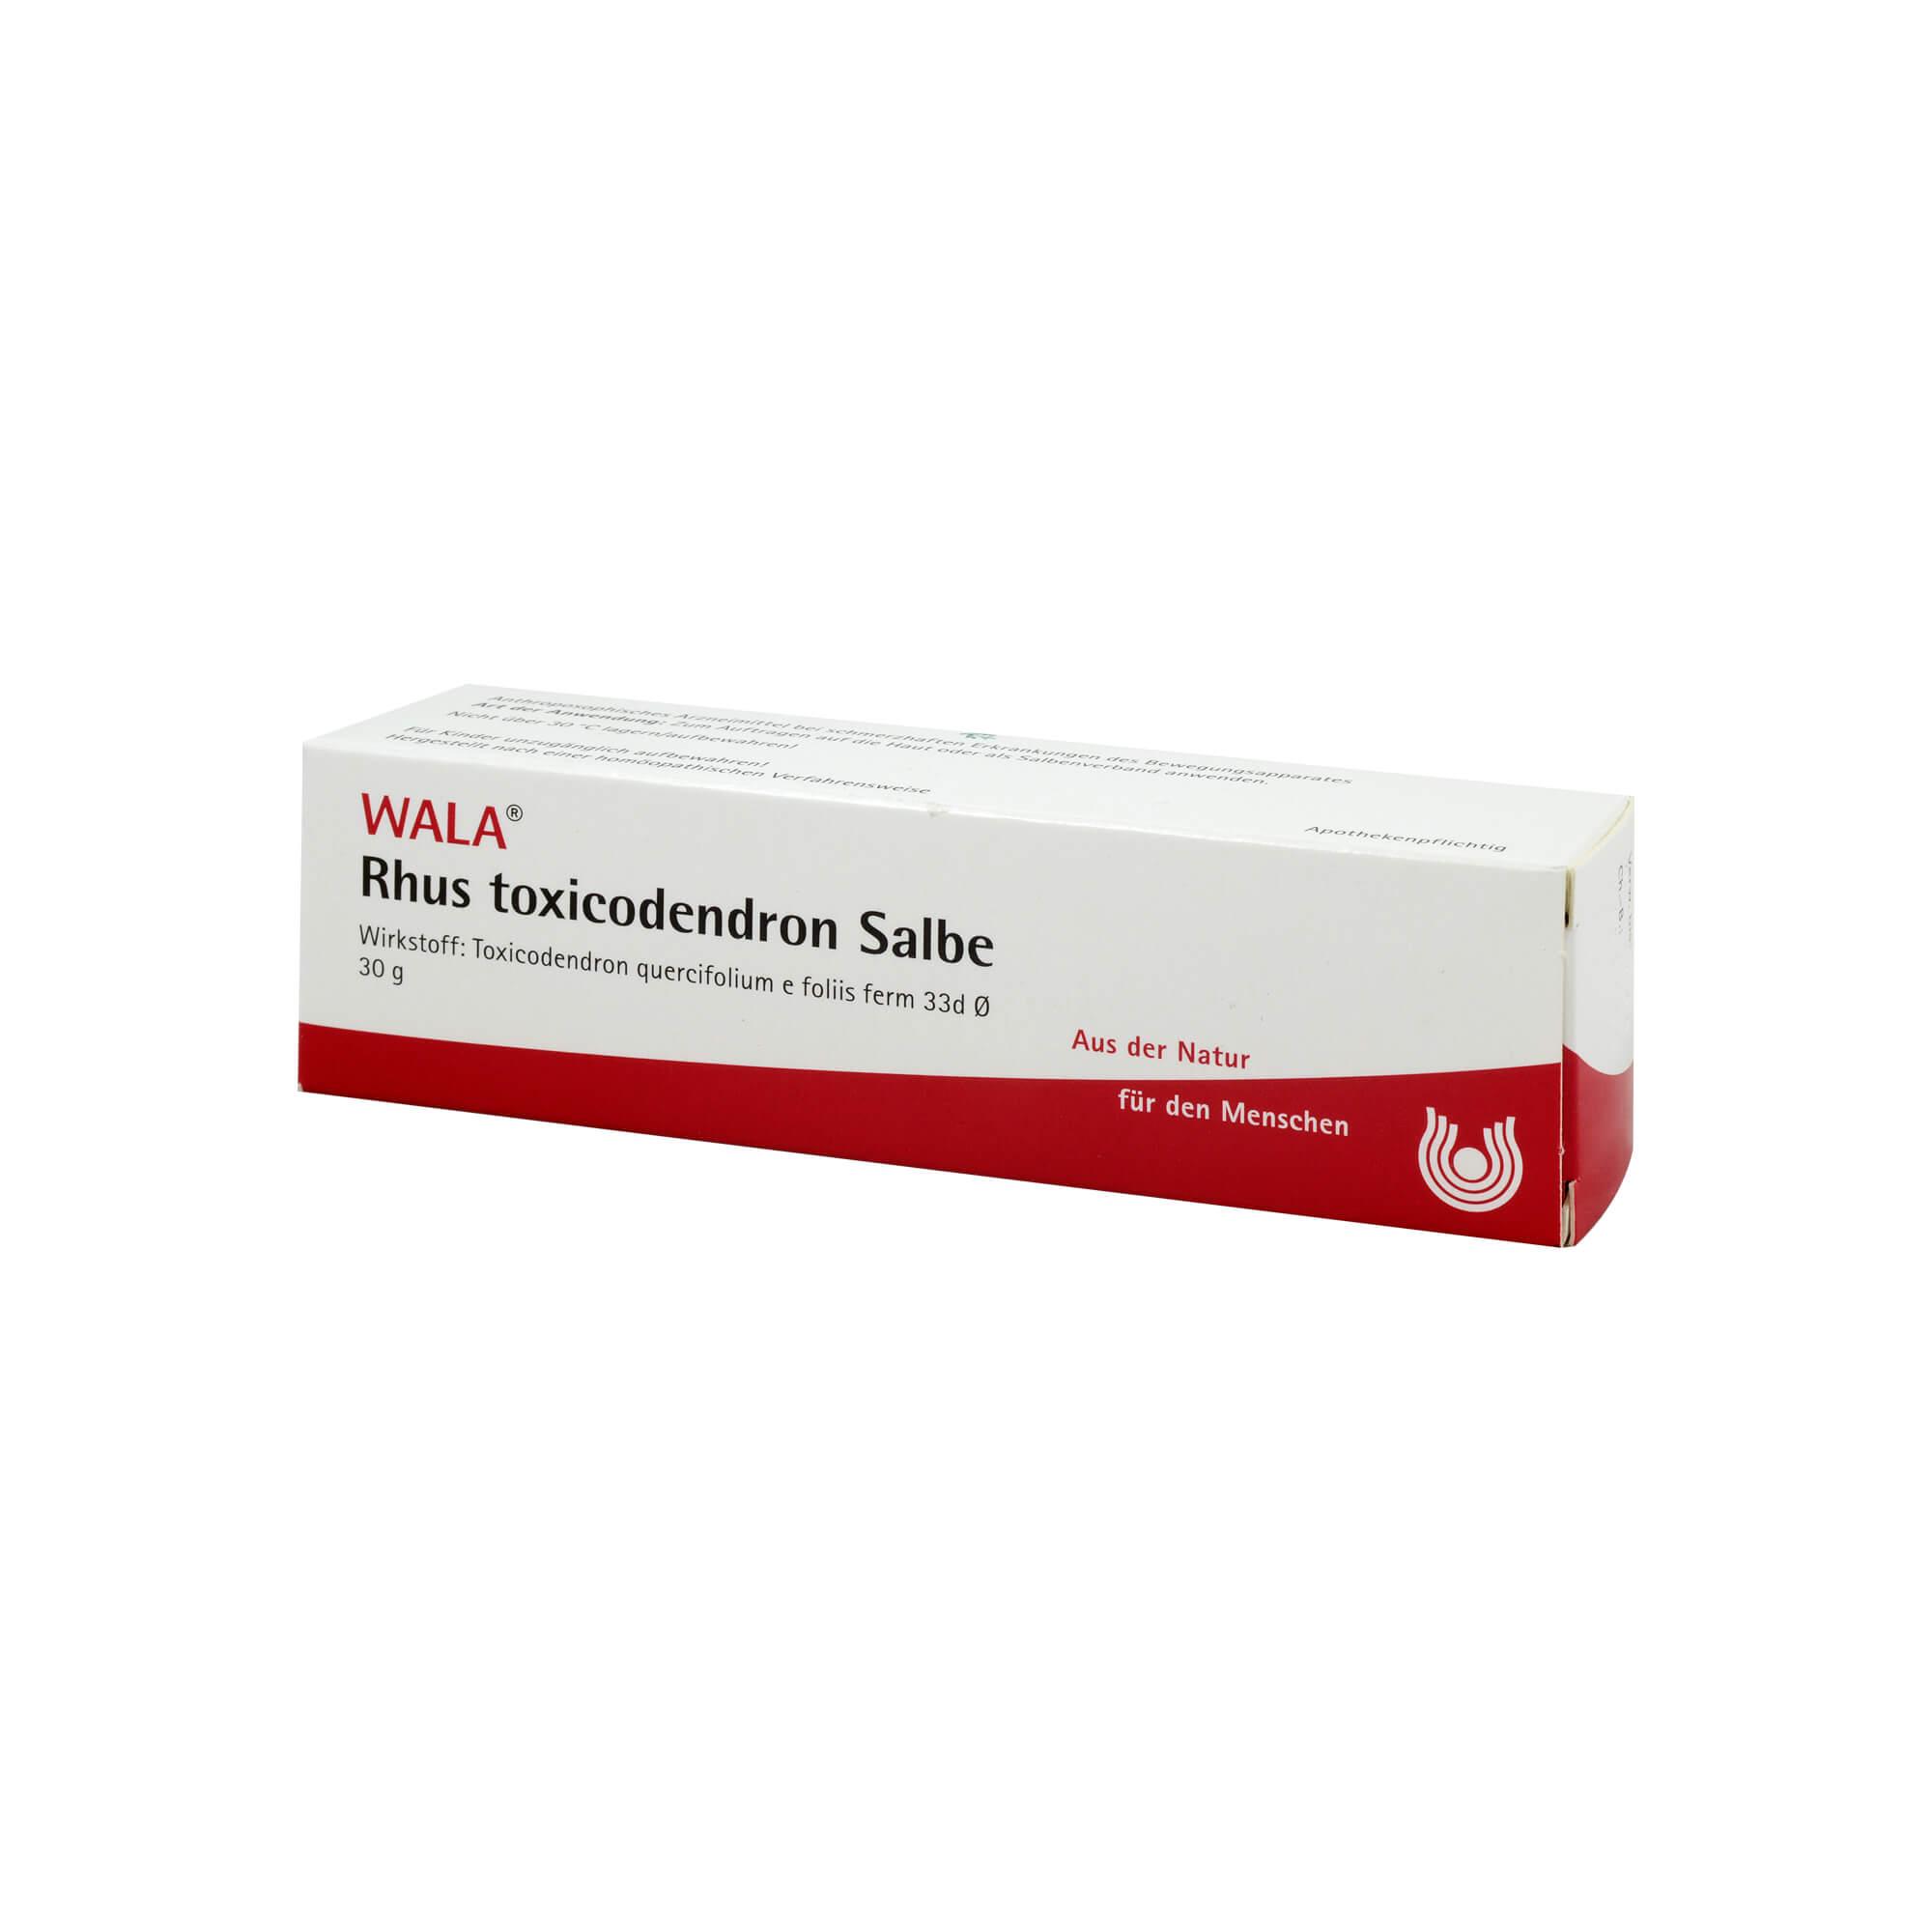 RHUS TOXICODENDRON SALBE